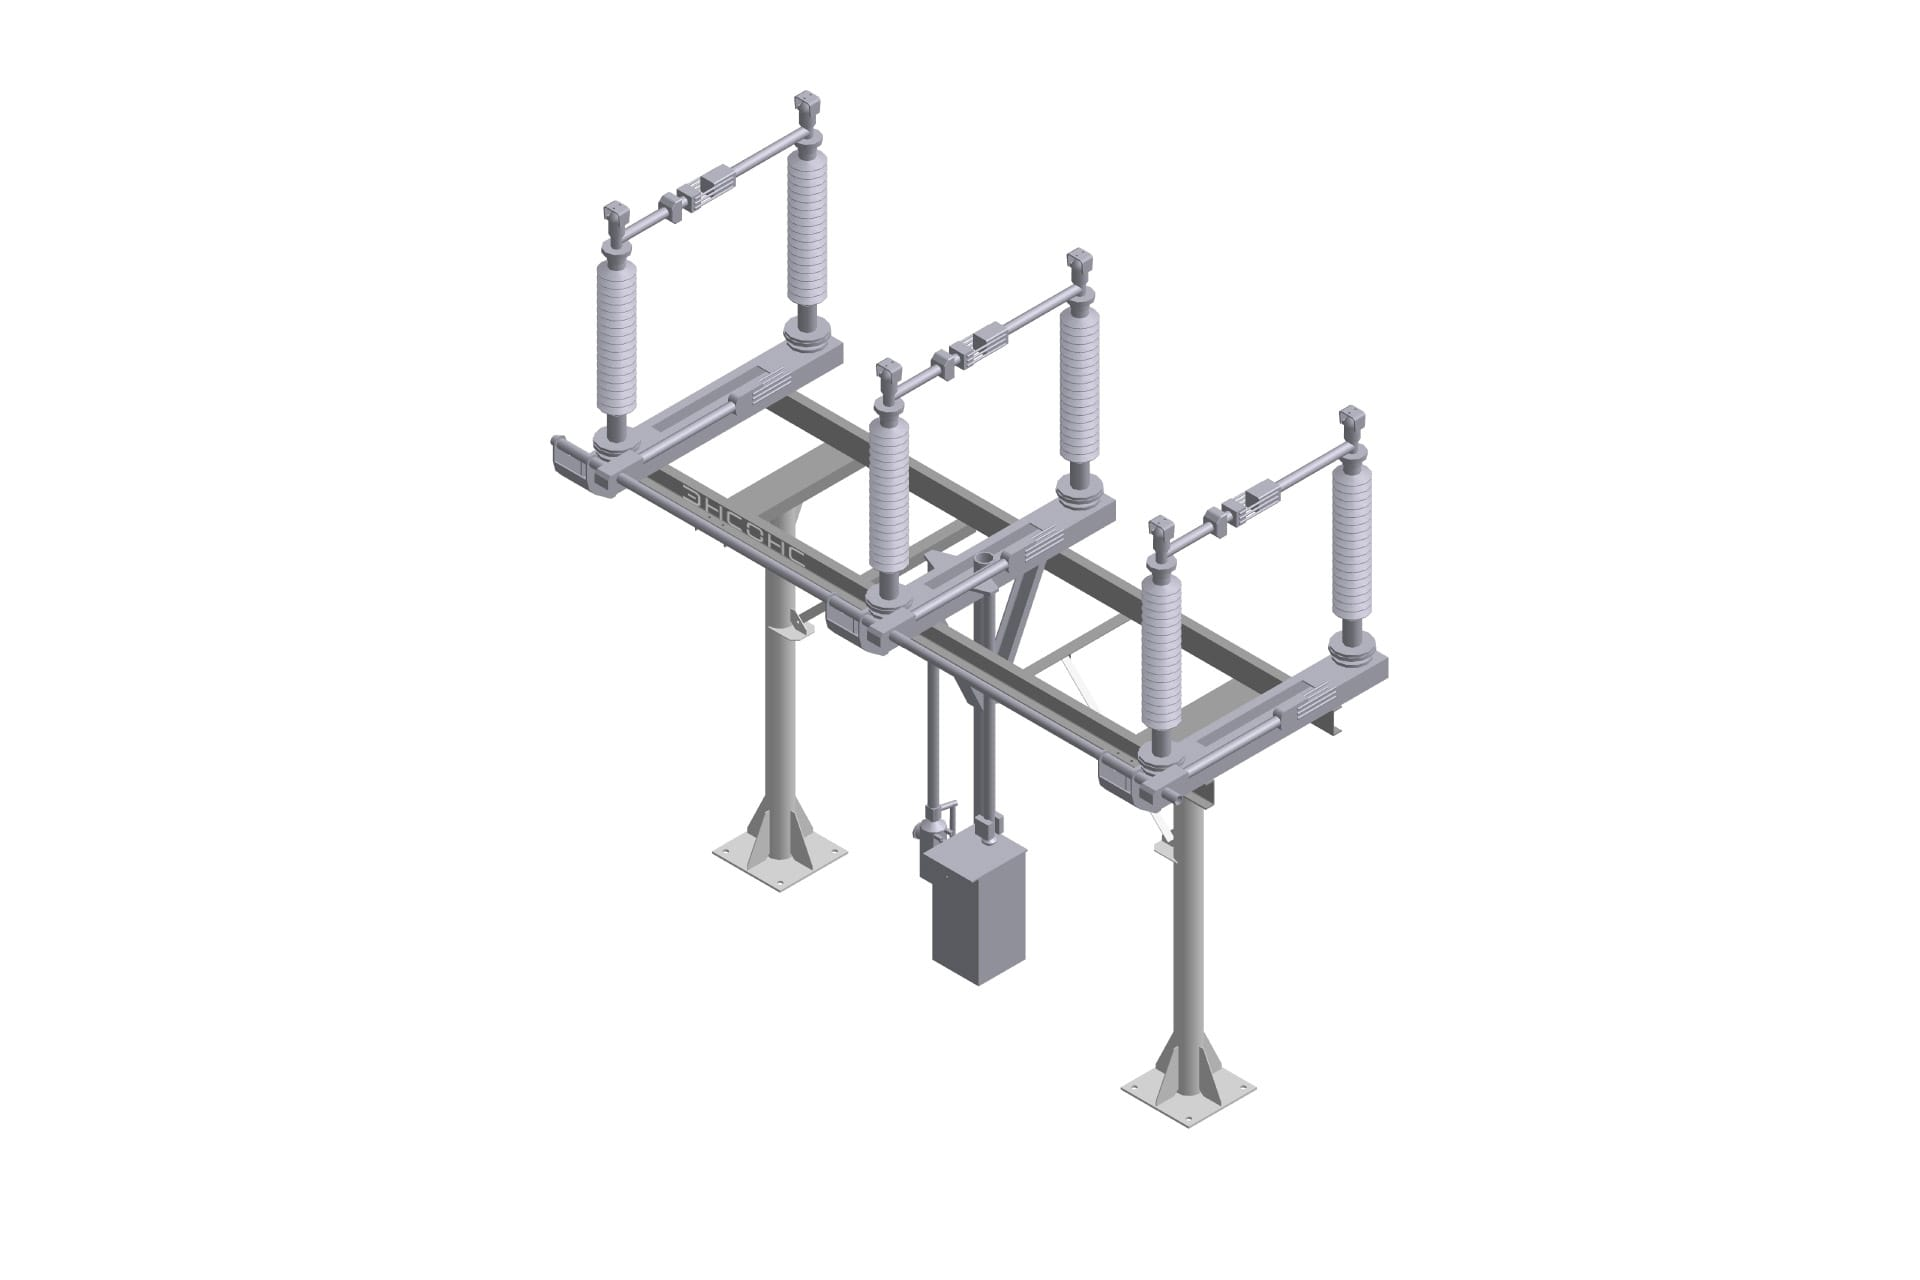 Ensons - Блок трехполюсного разъединителя 110 кВ